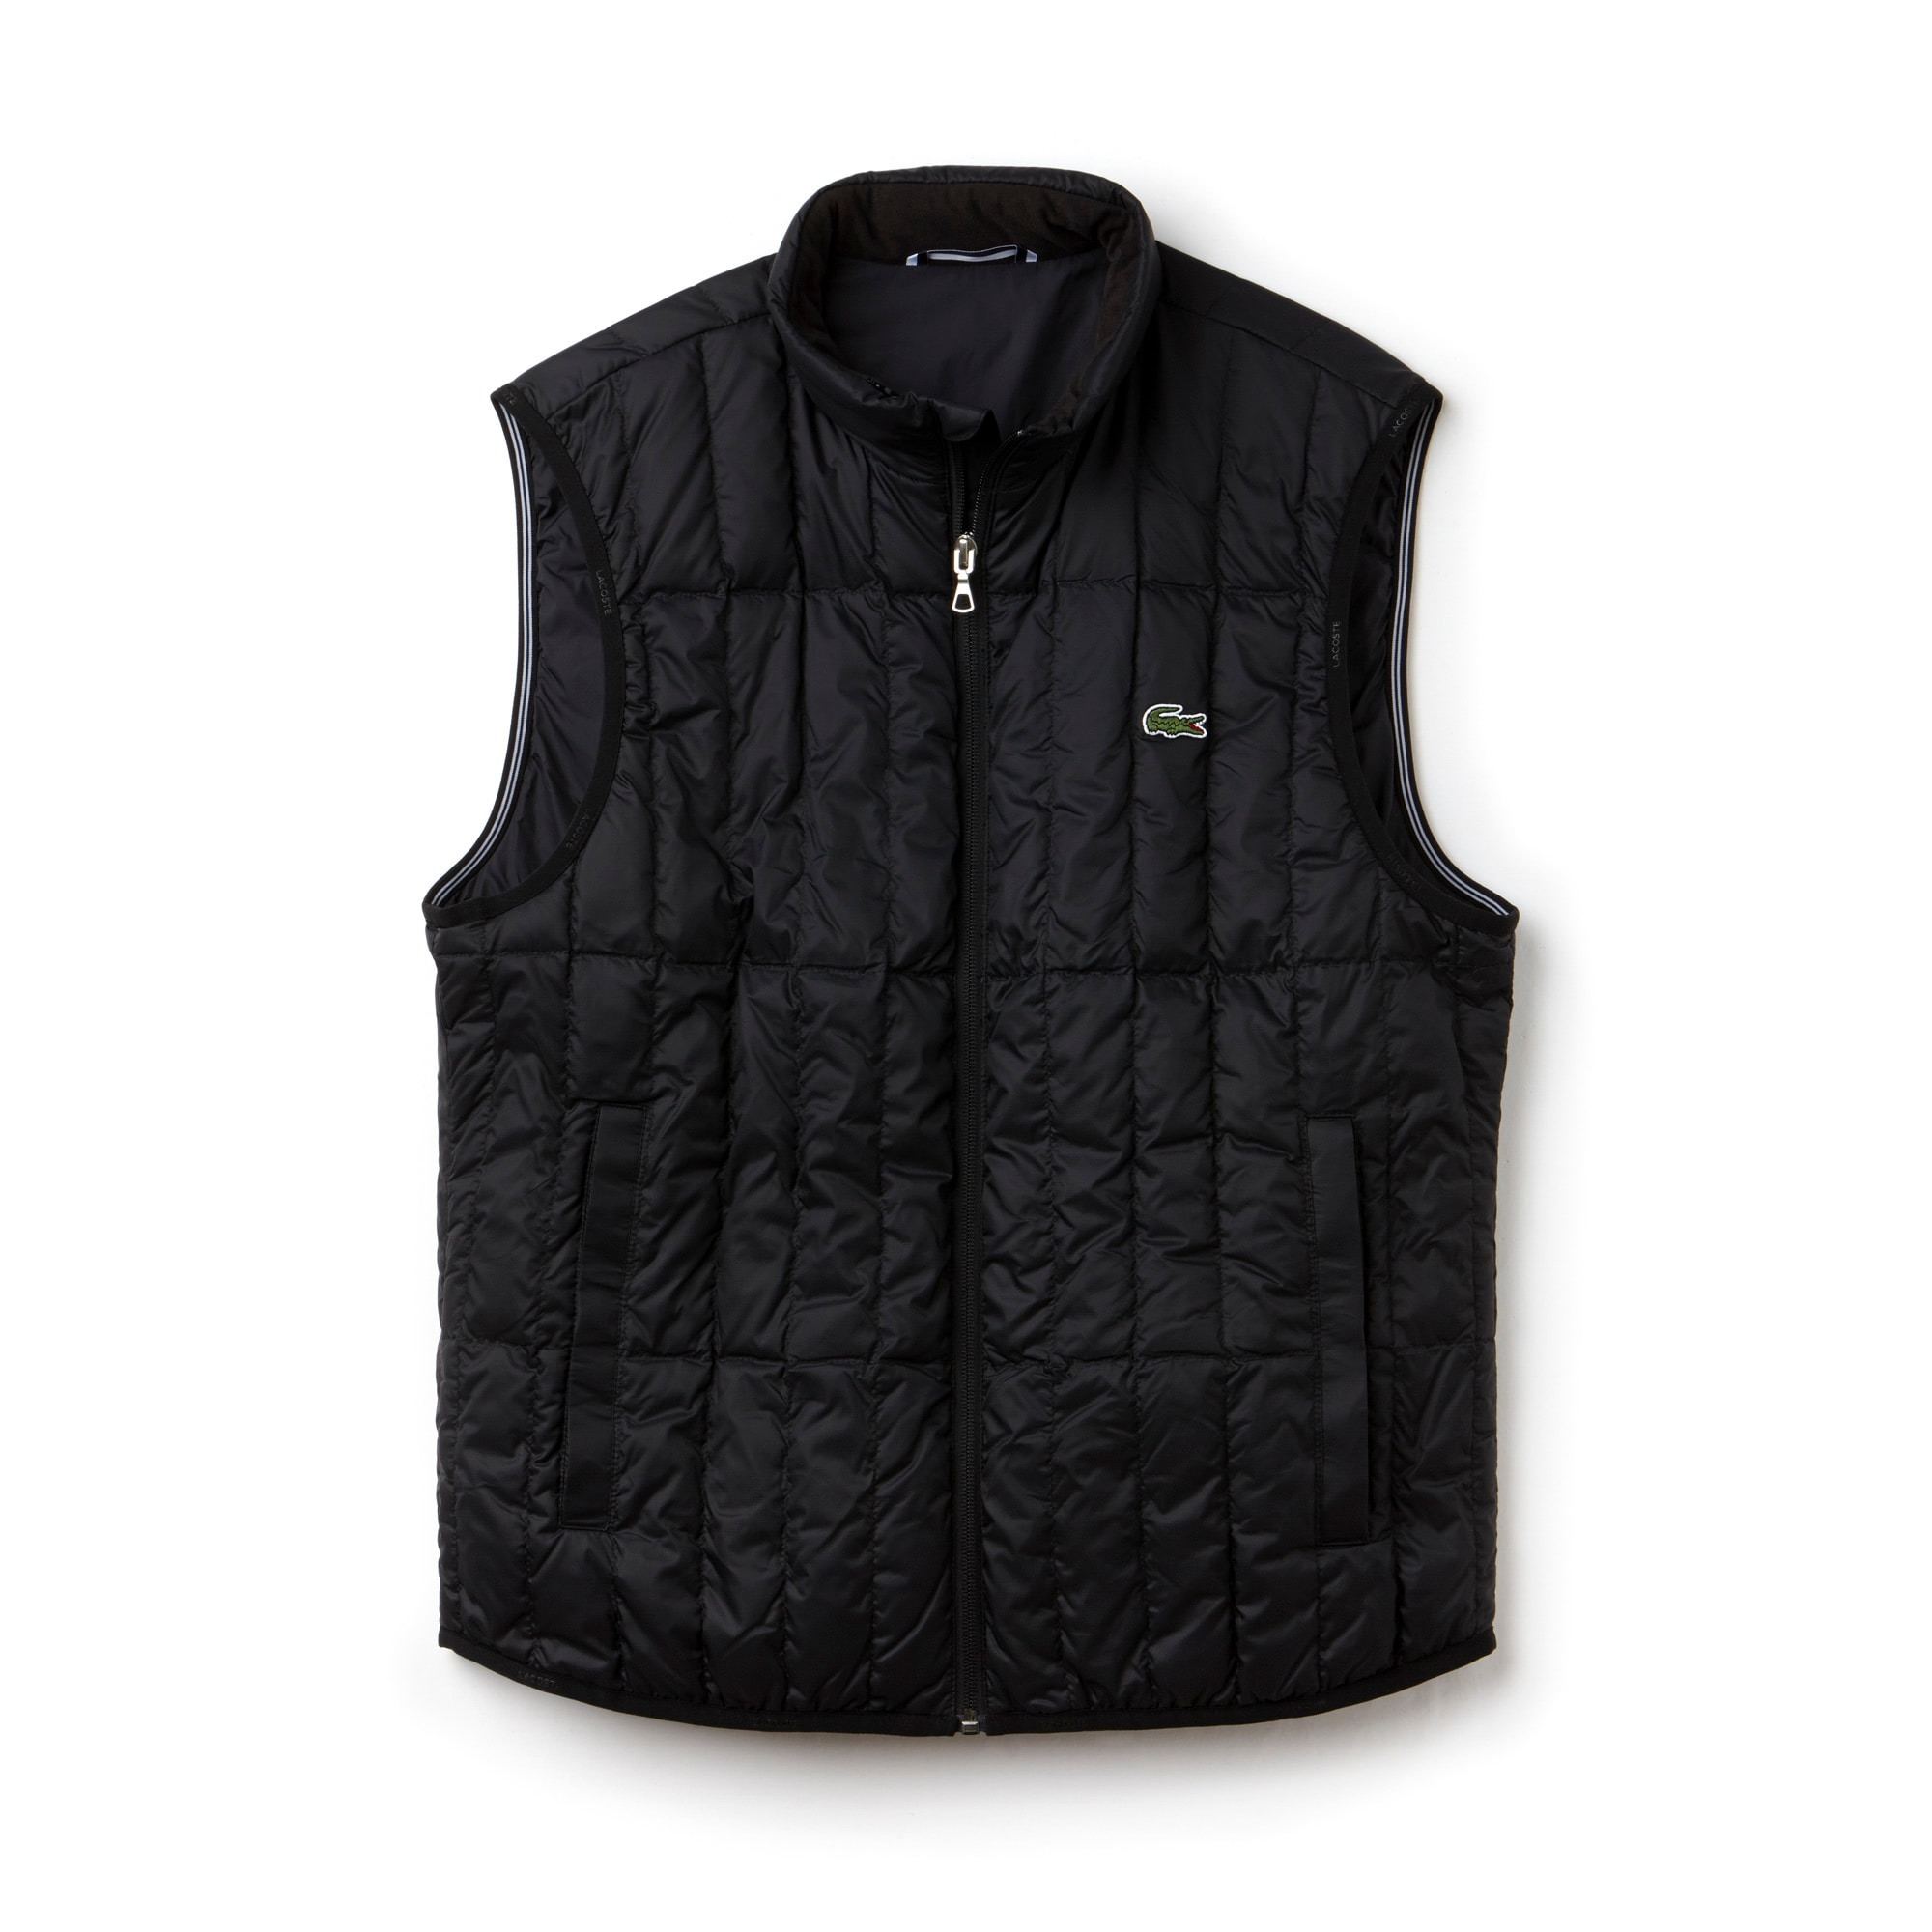 Men's Lightweight Built-in Hood Quilted Down Packable Vest | LACOSTE : mens lightweight quilted jacket - Adamdwight.com